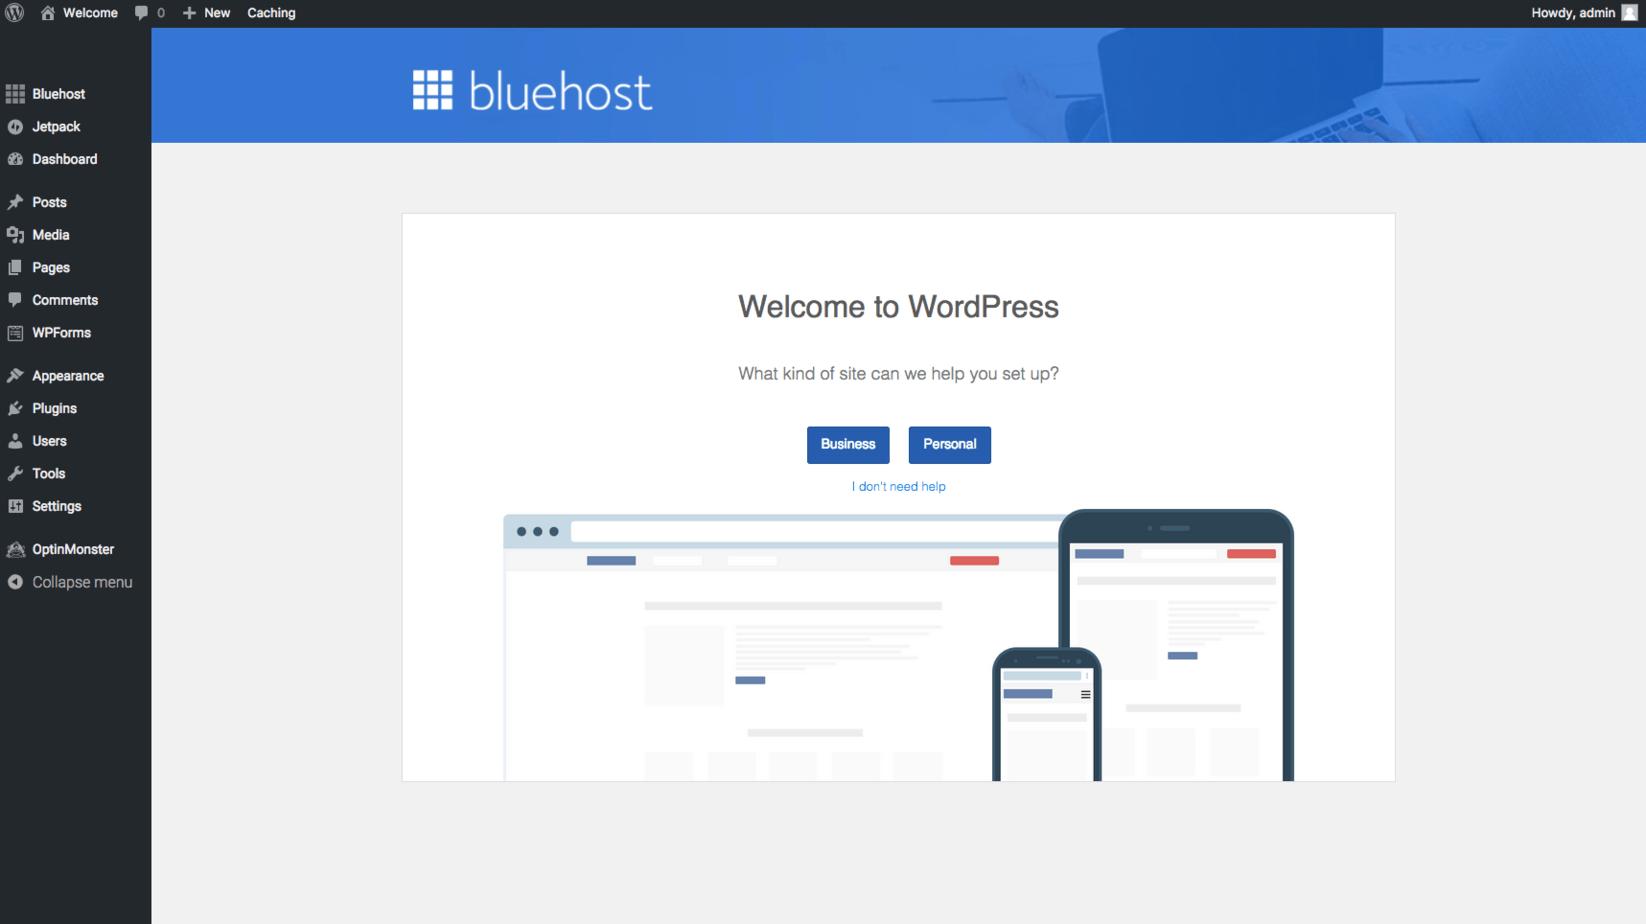 bluehost WP Dashboard